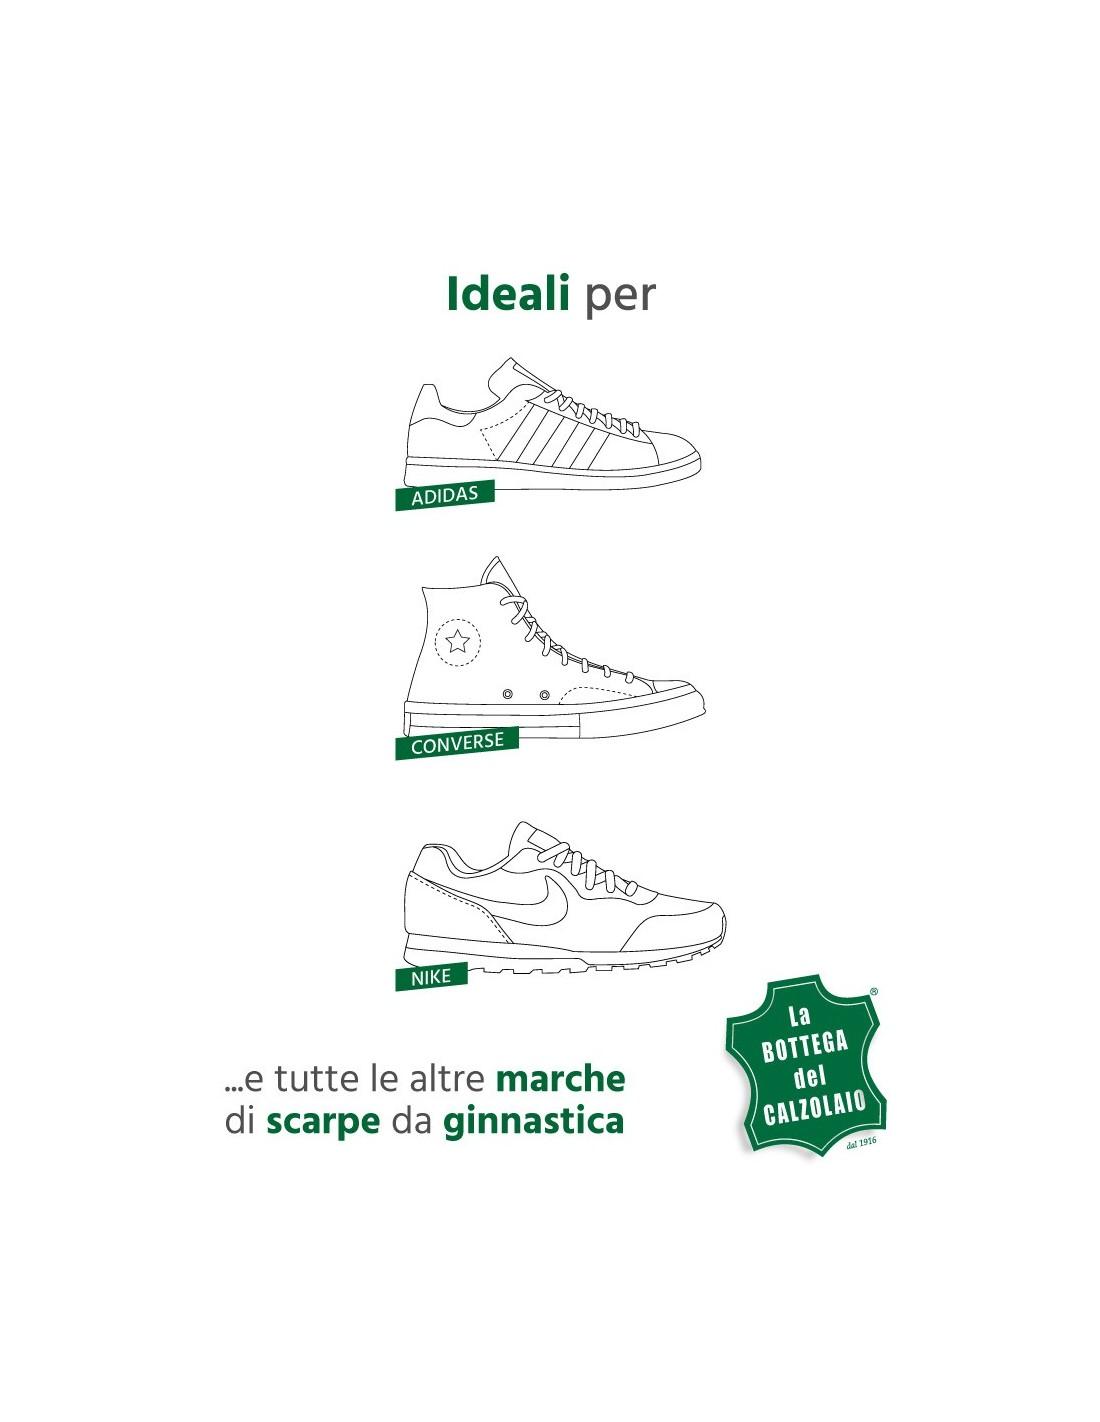 3cff765ec2acc Lacci scarpe piatti per sneakers